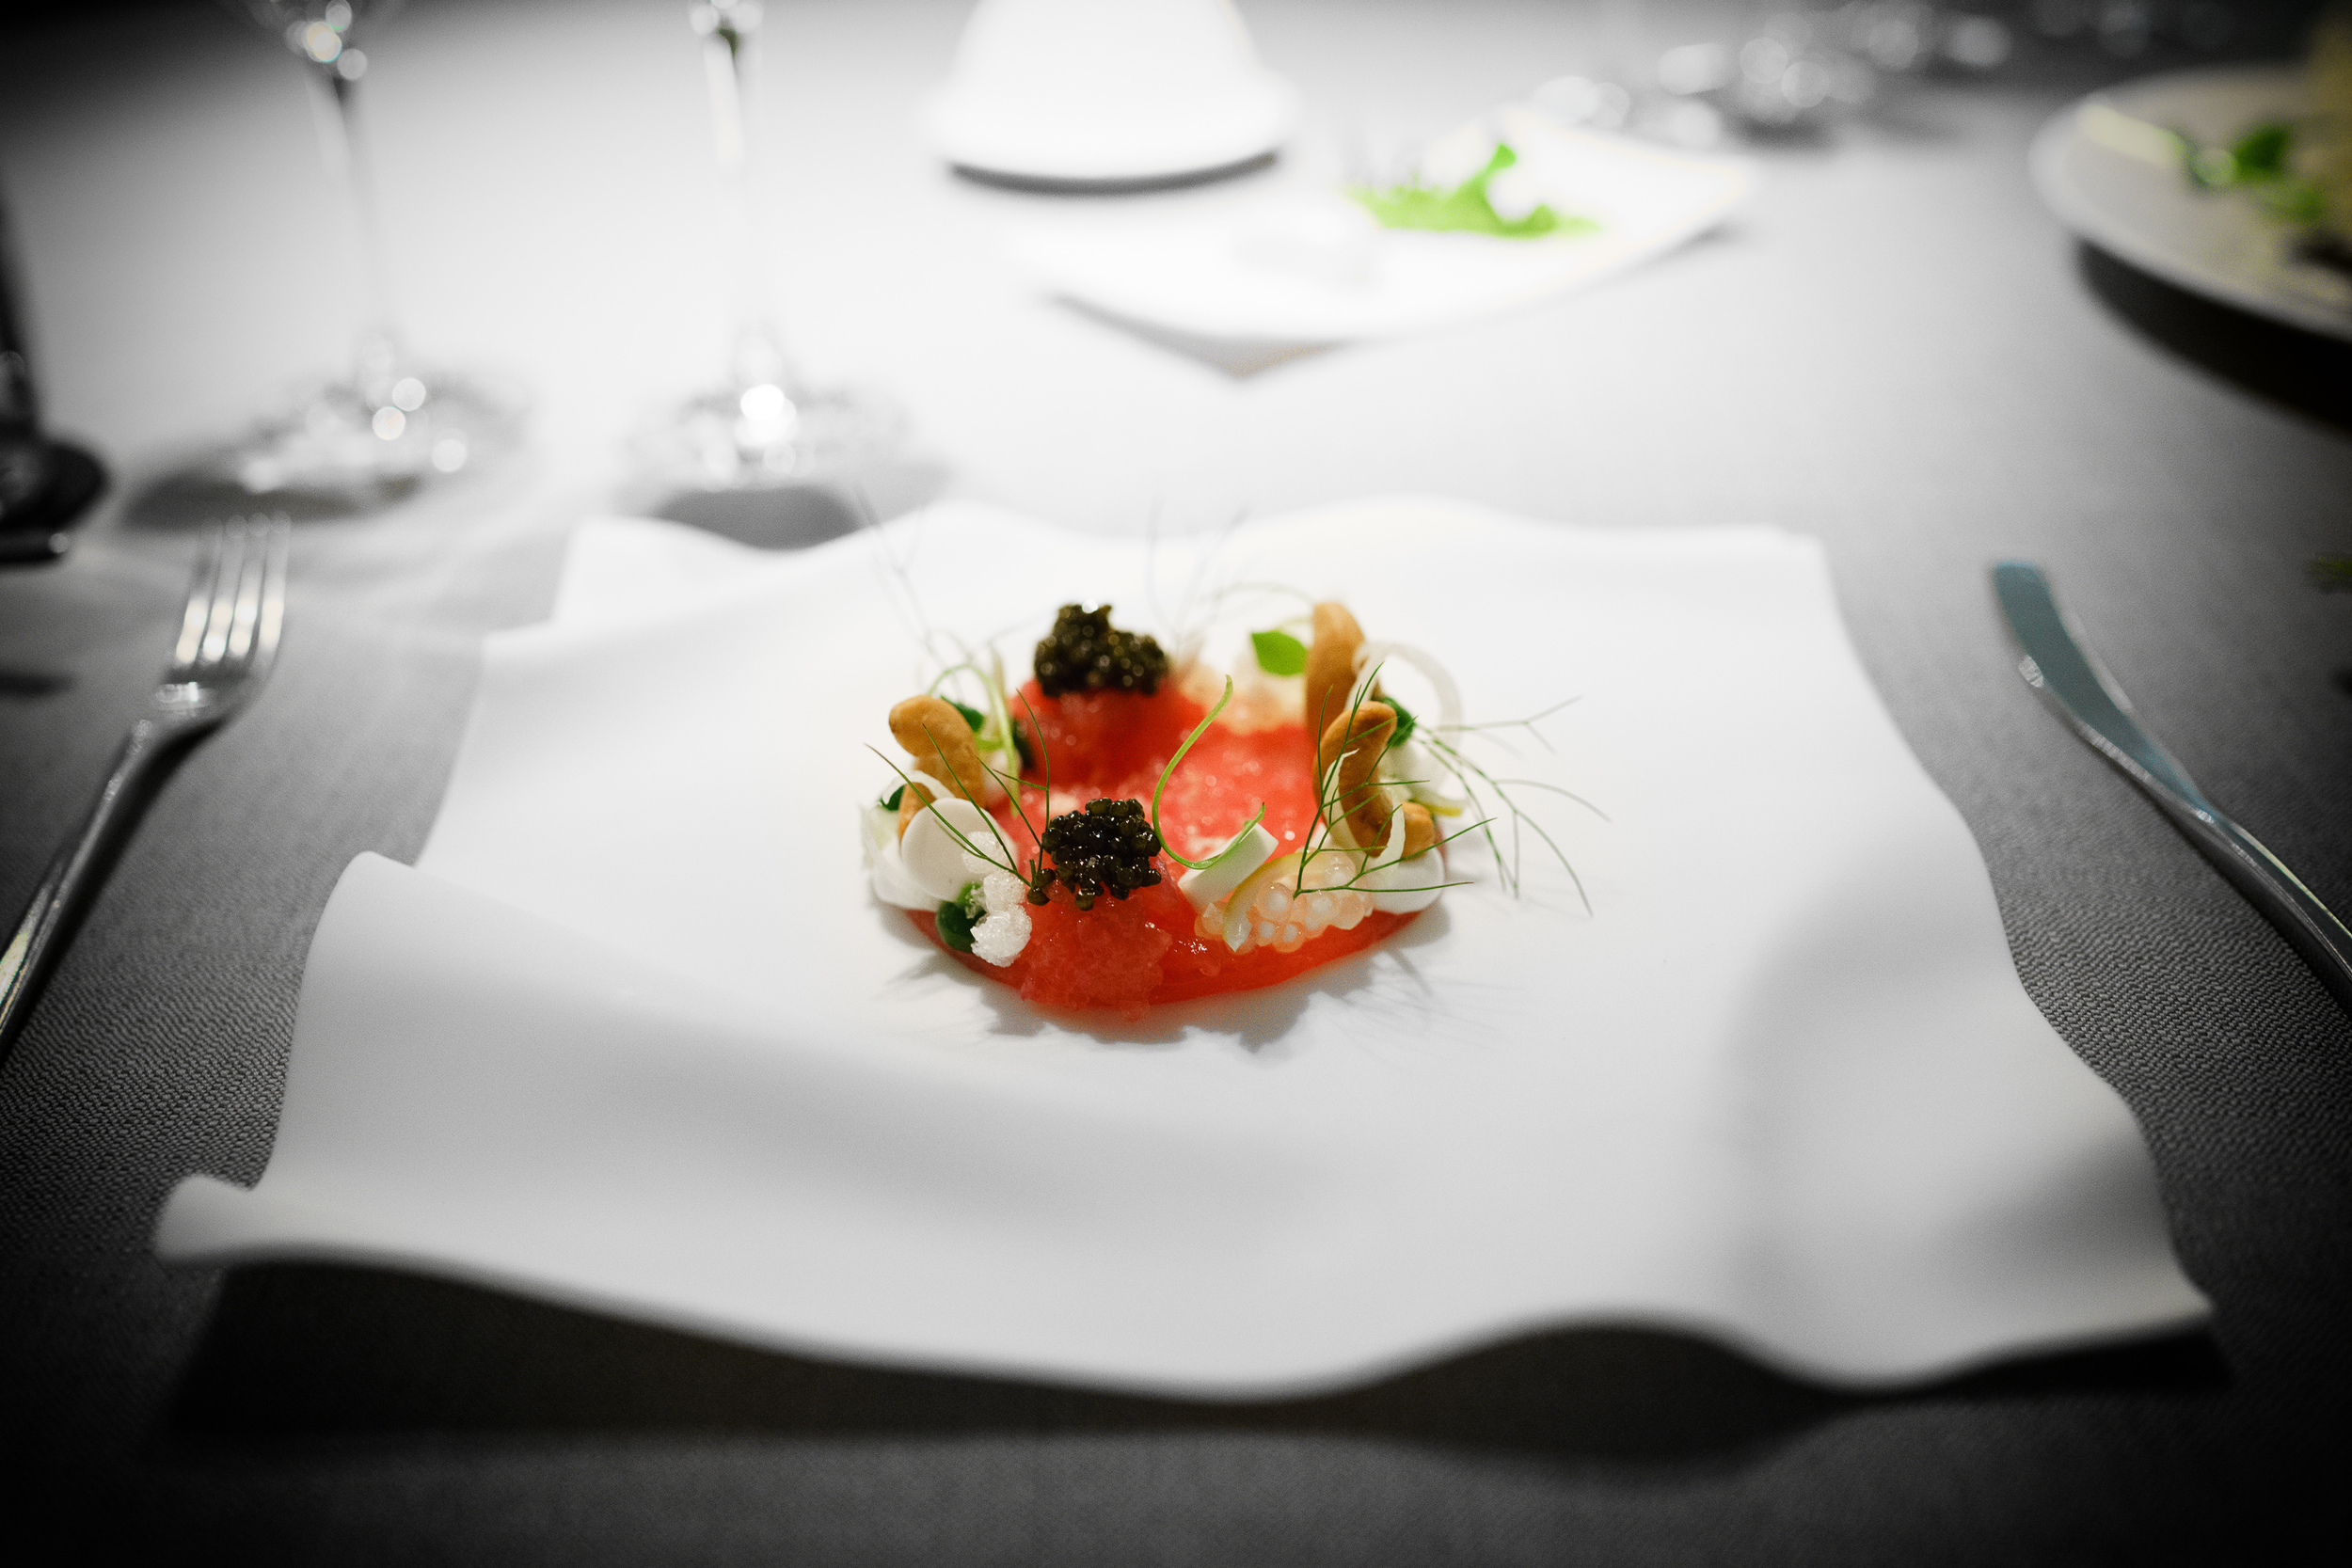 Big eye tuna, caviar, coconut, miner's lettuce